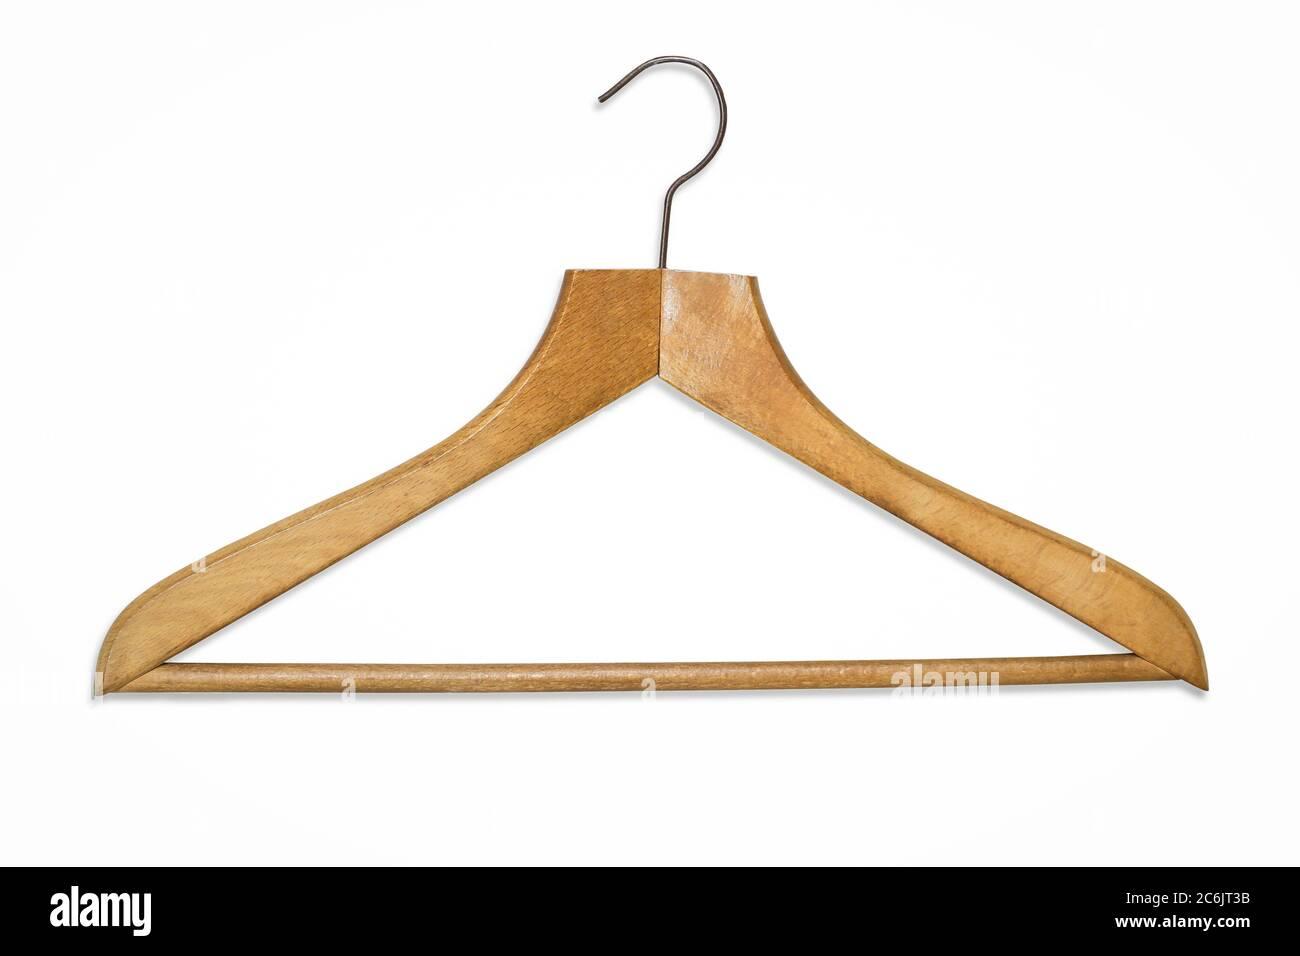 Percha de madera con gancho metálico aislada sobre fondo blanco Foto de stock